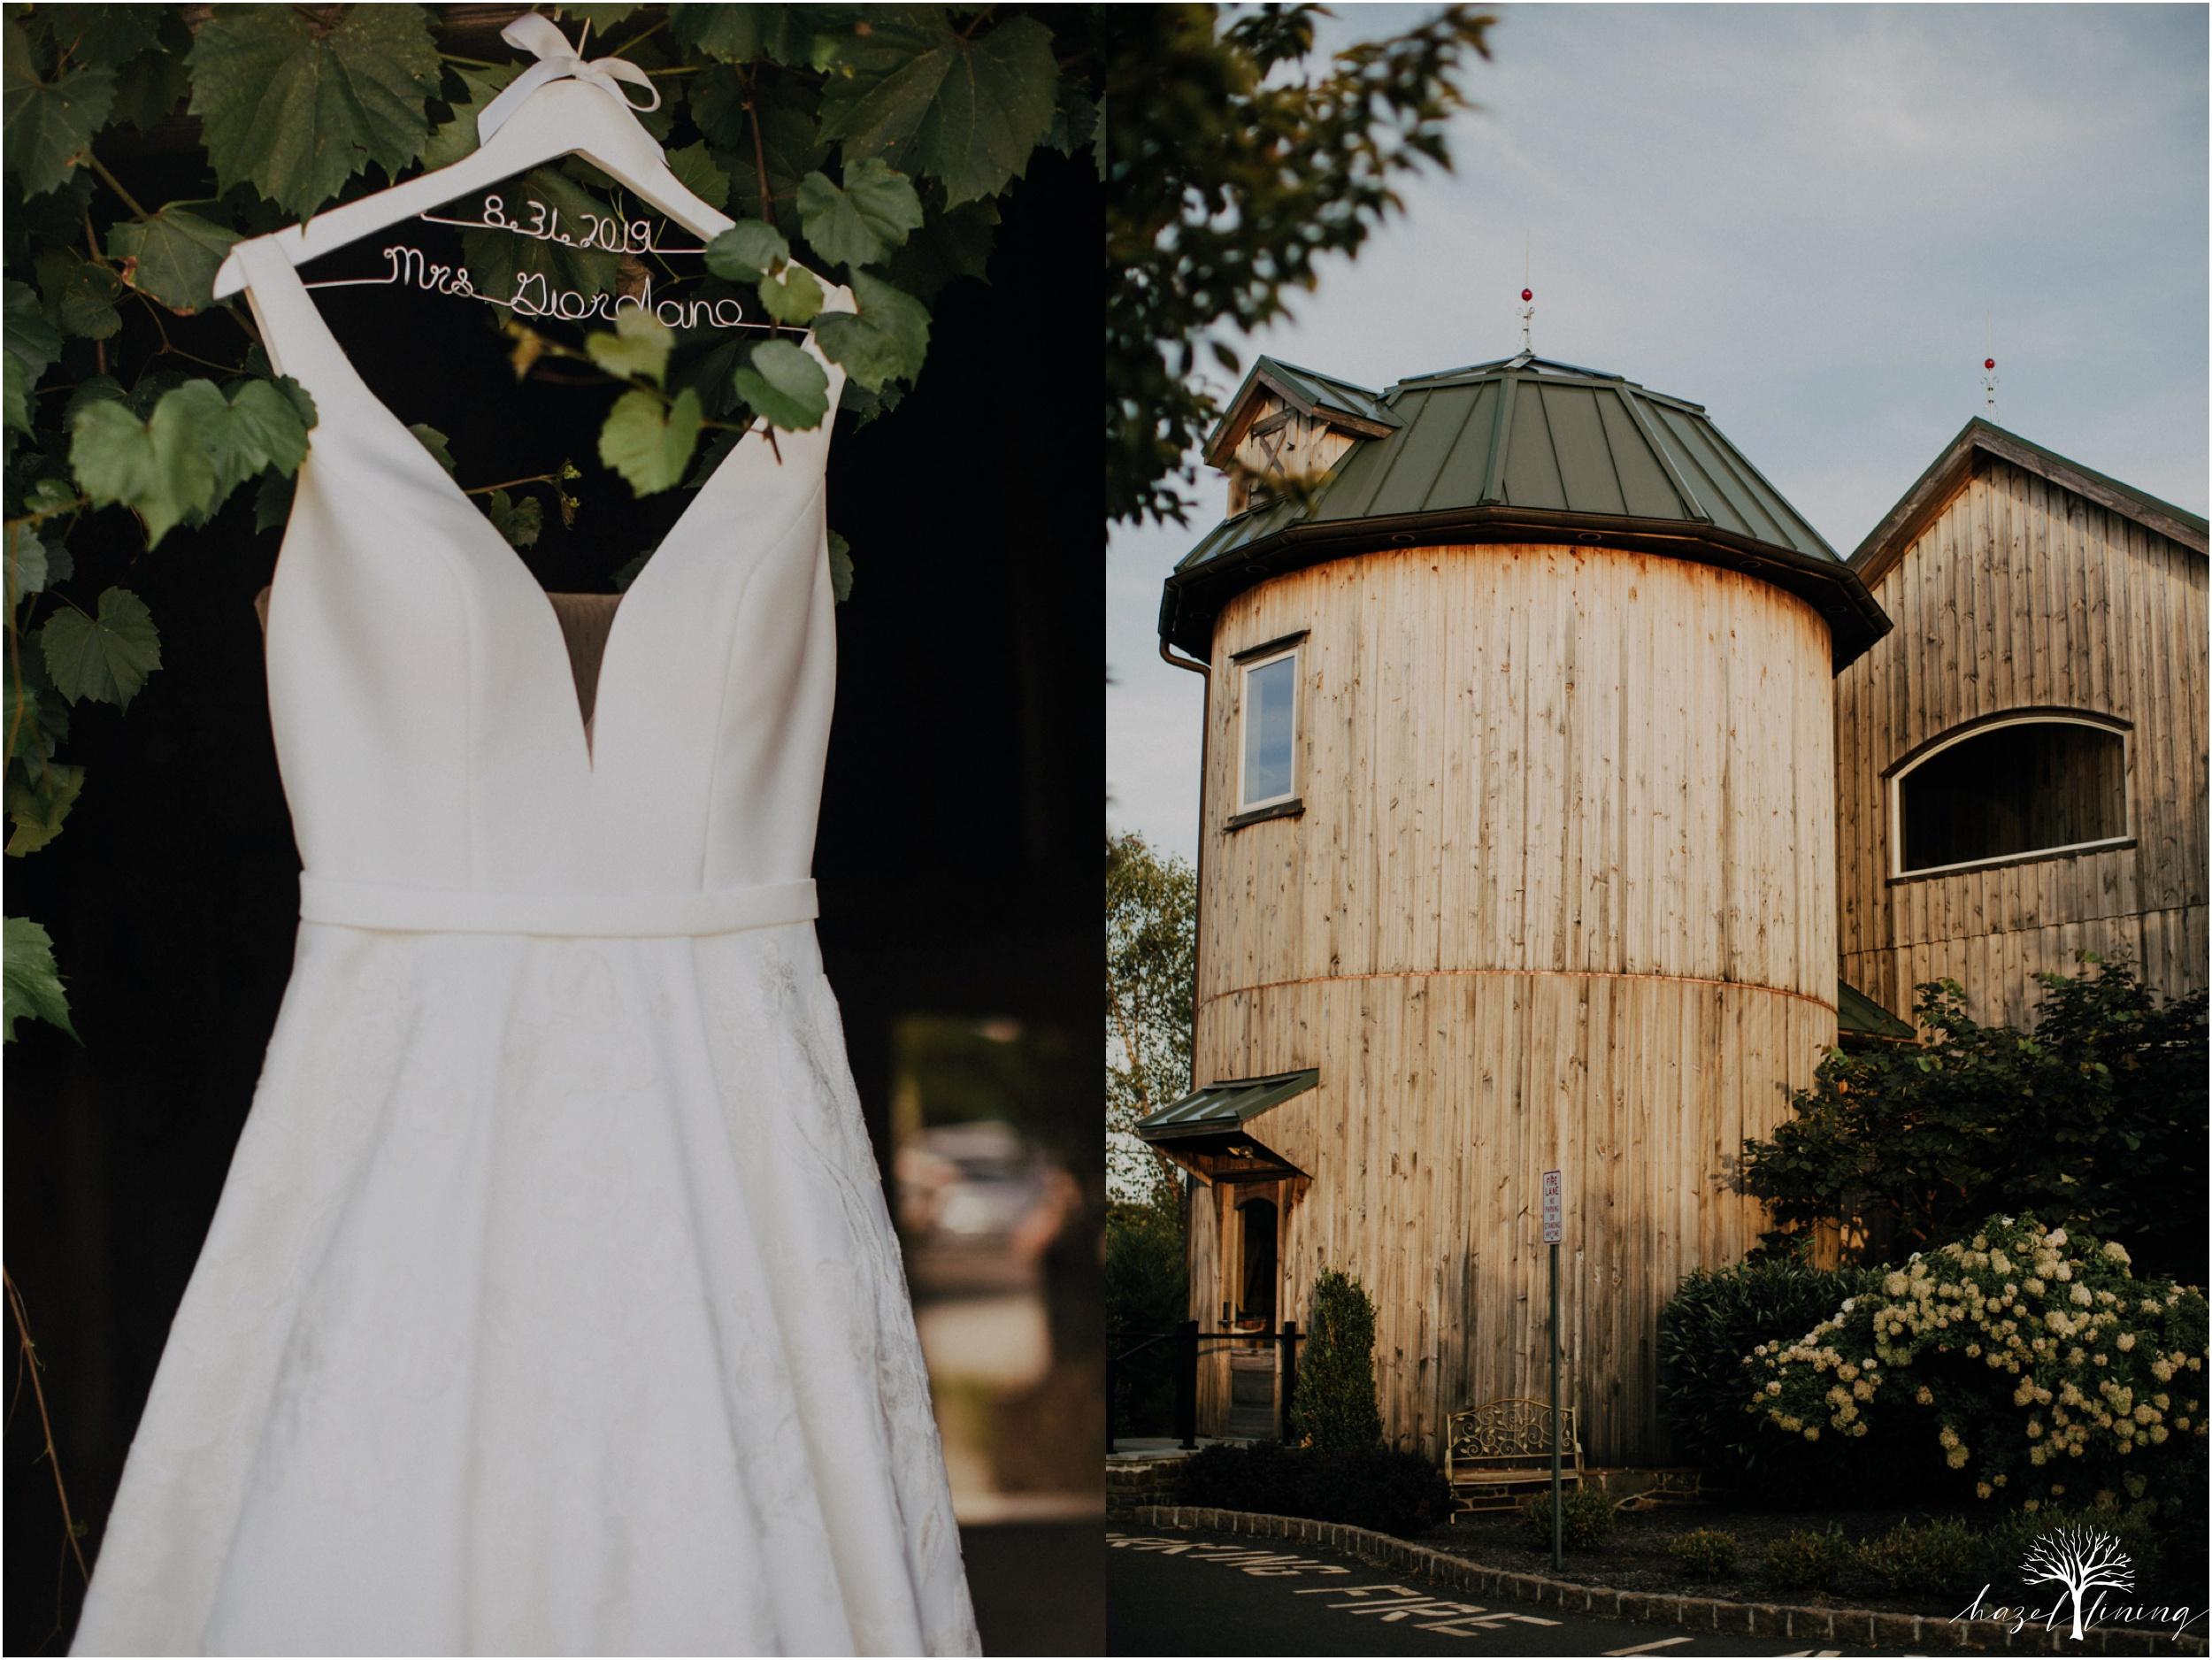 maureen-hepner-anthony-giordano-rose-bank-winery-newtow-pennsylvania-luxury-summer-wedding-hazel-lining-photography-destination-elopement-wedding-engagement-photography_0002.jpg